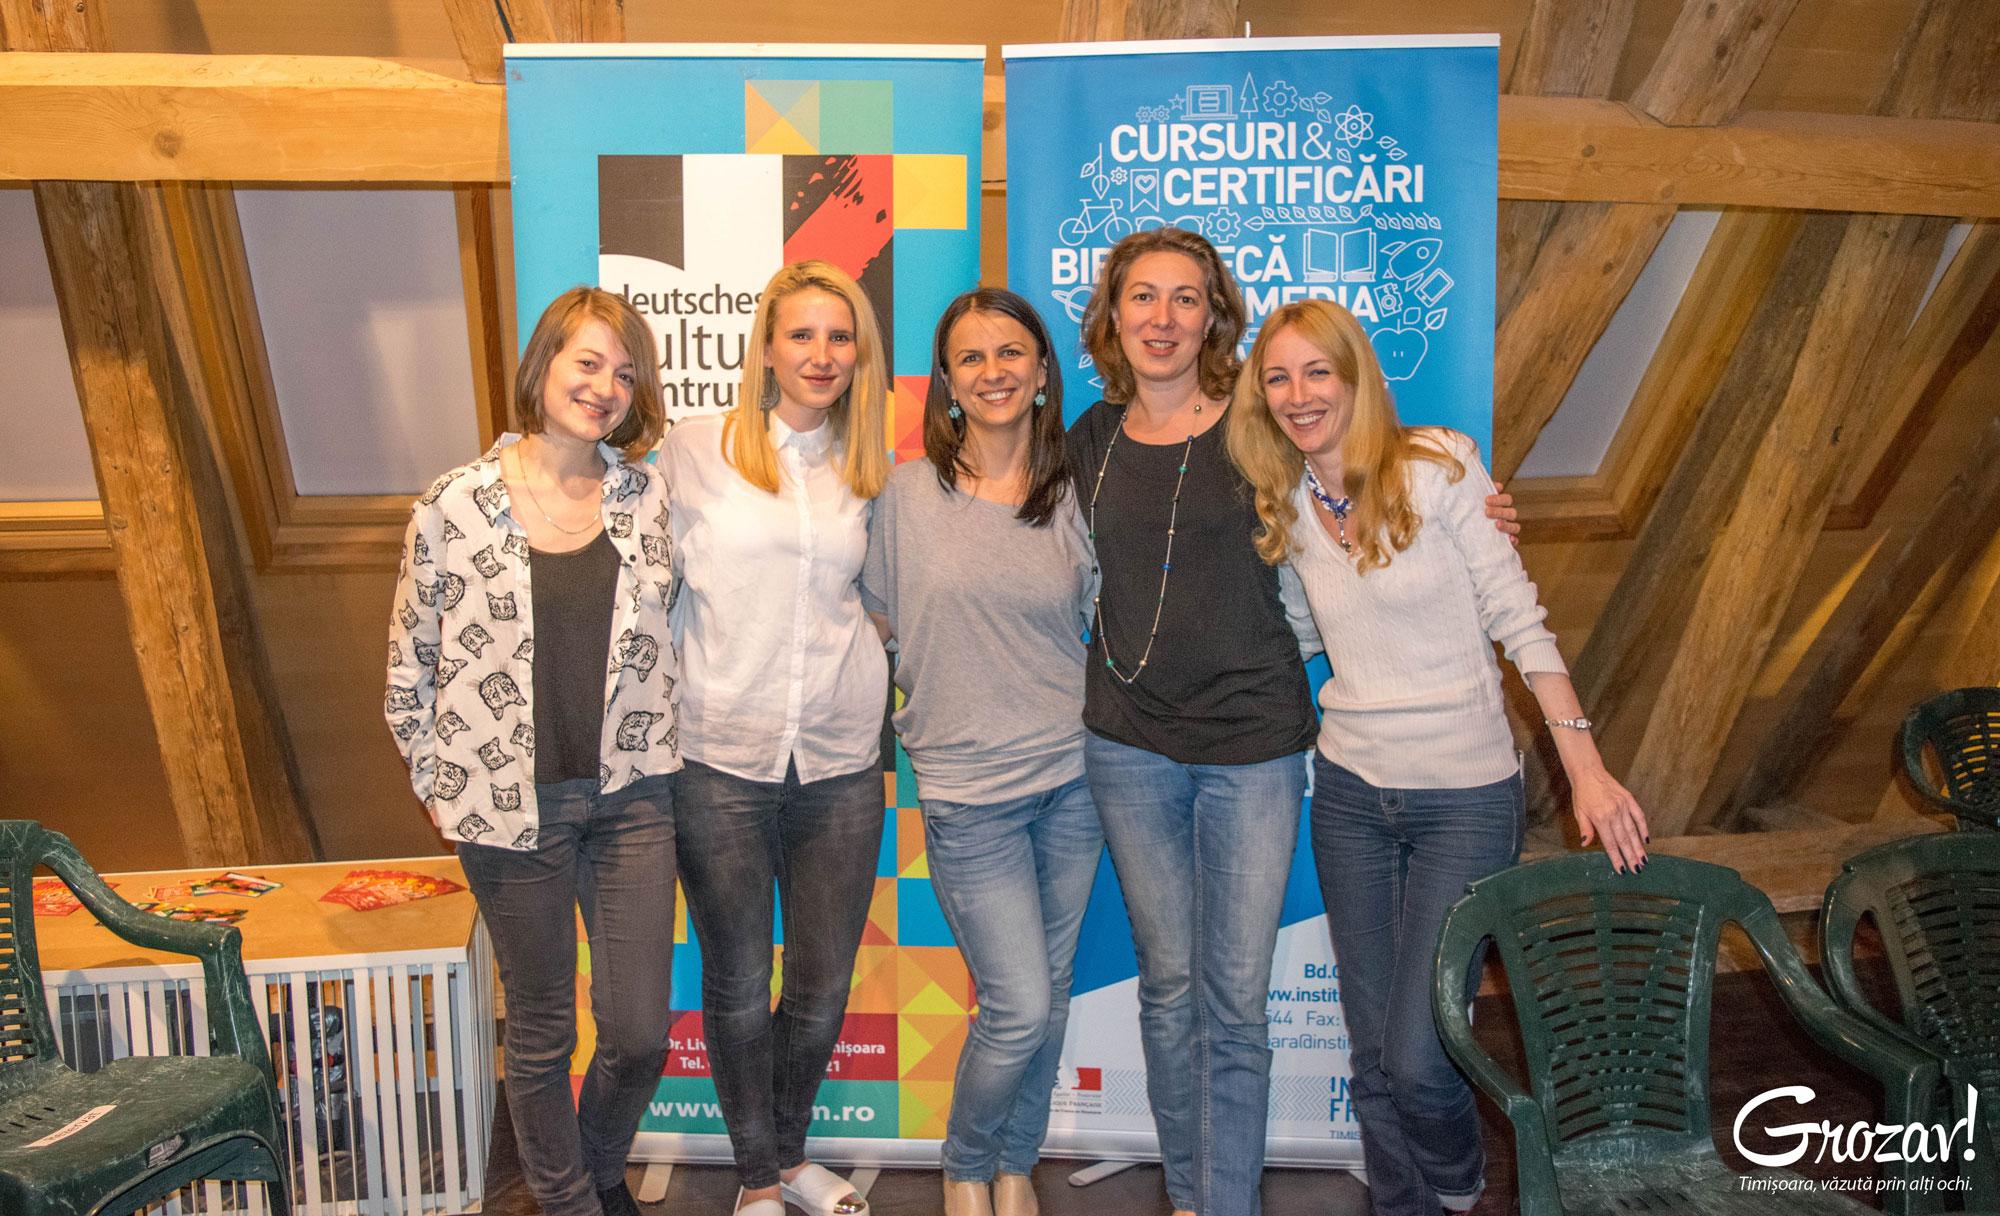 Cafekultour Timisoara 2015 Echipa de Organizare